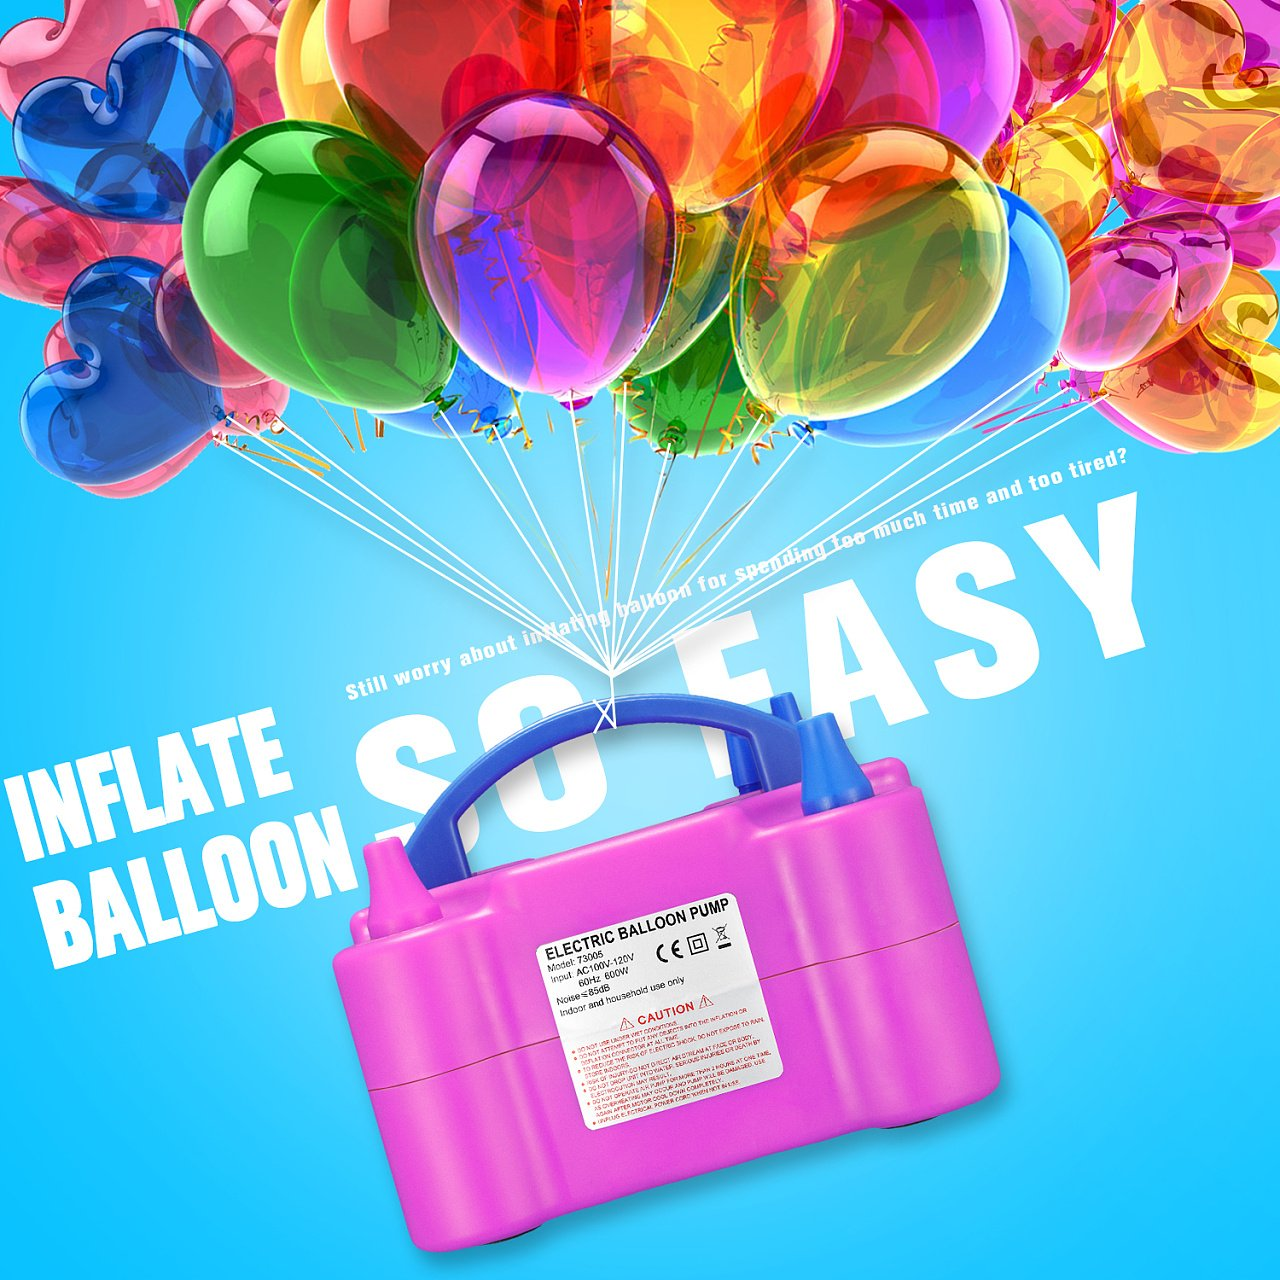 Zecti Luftballonpumpe 600 Watt Elektrische Ballonpumpe Aufblasgerat